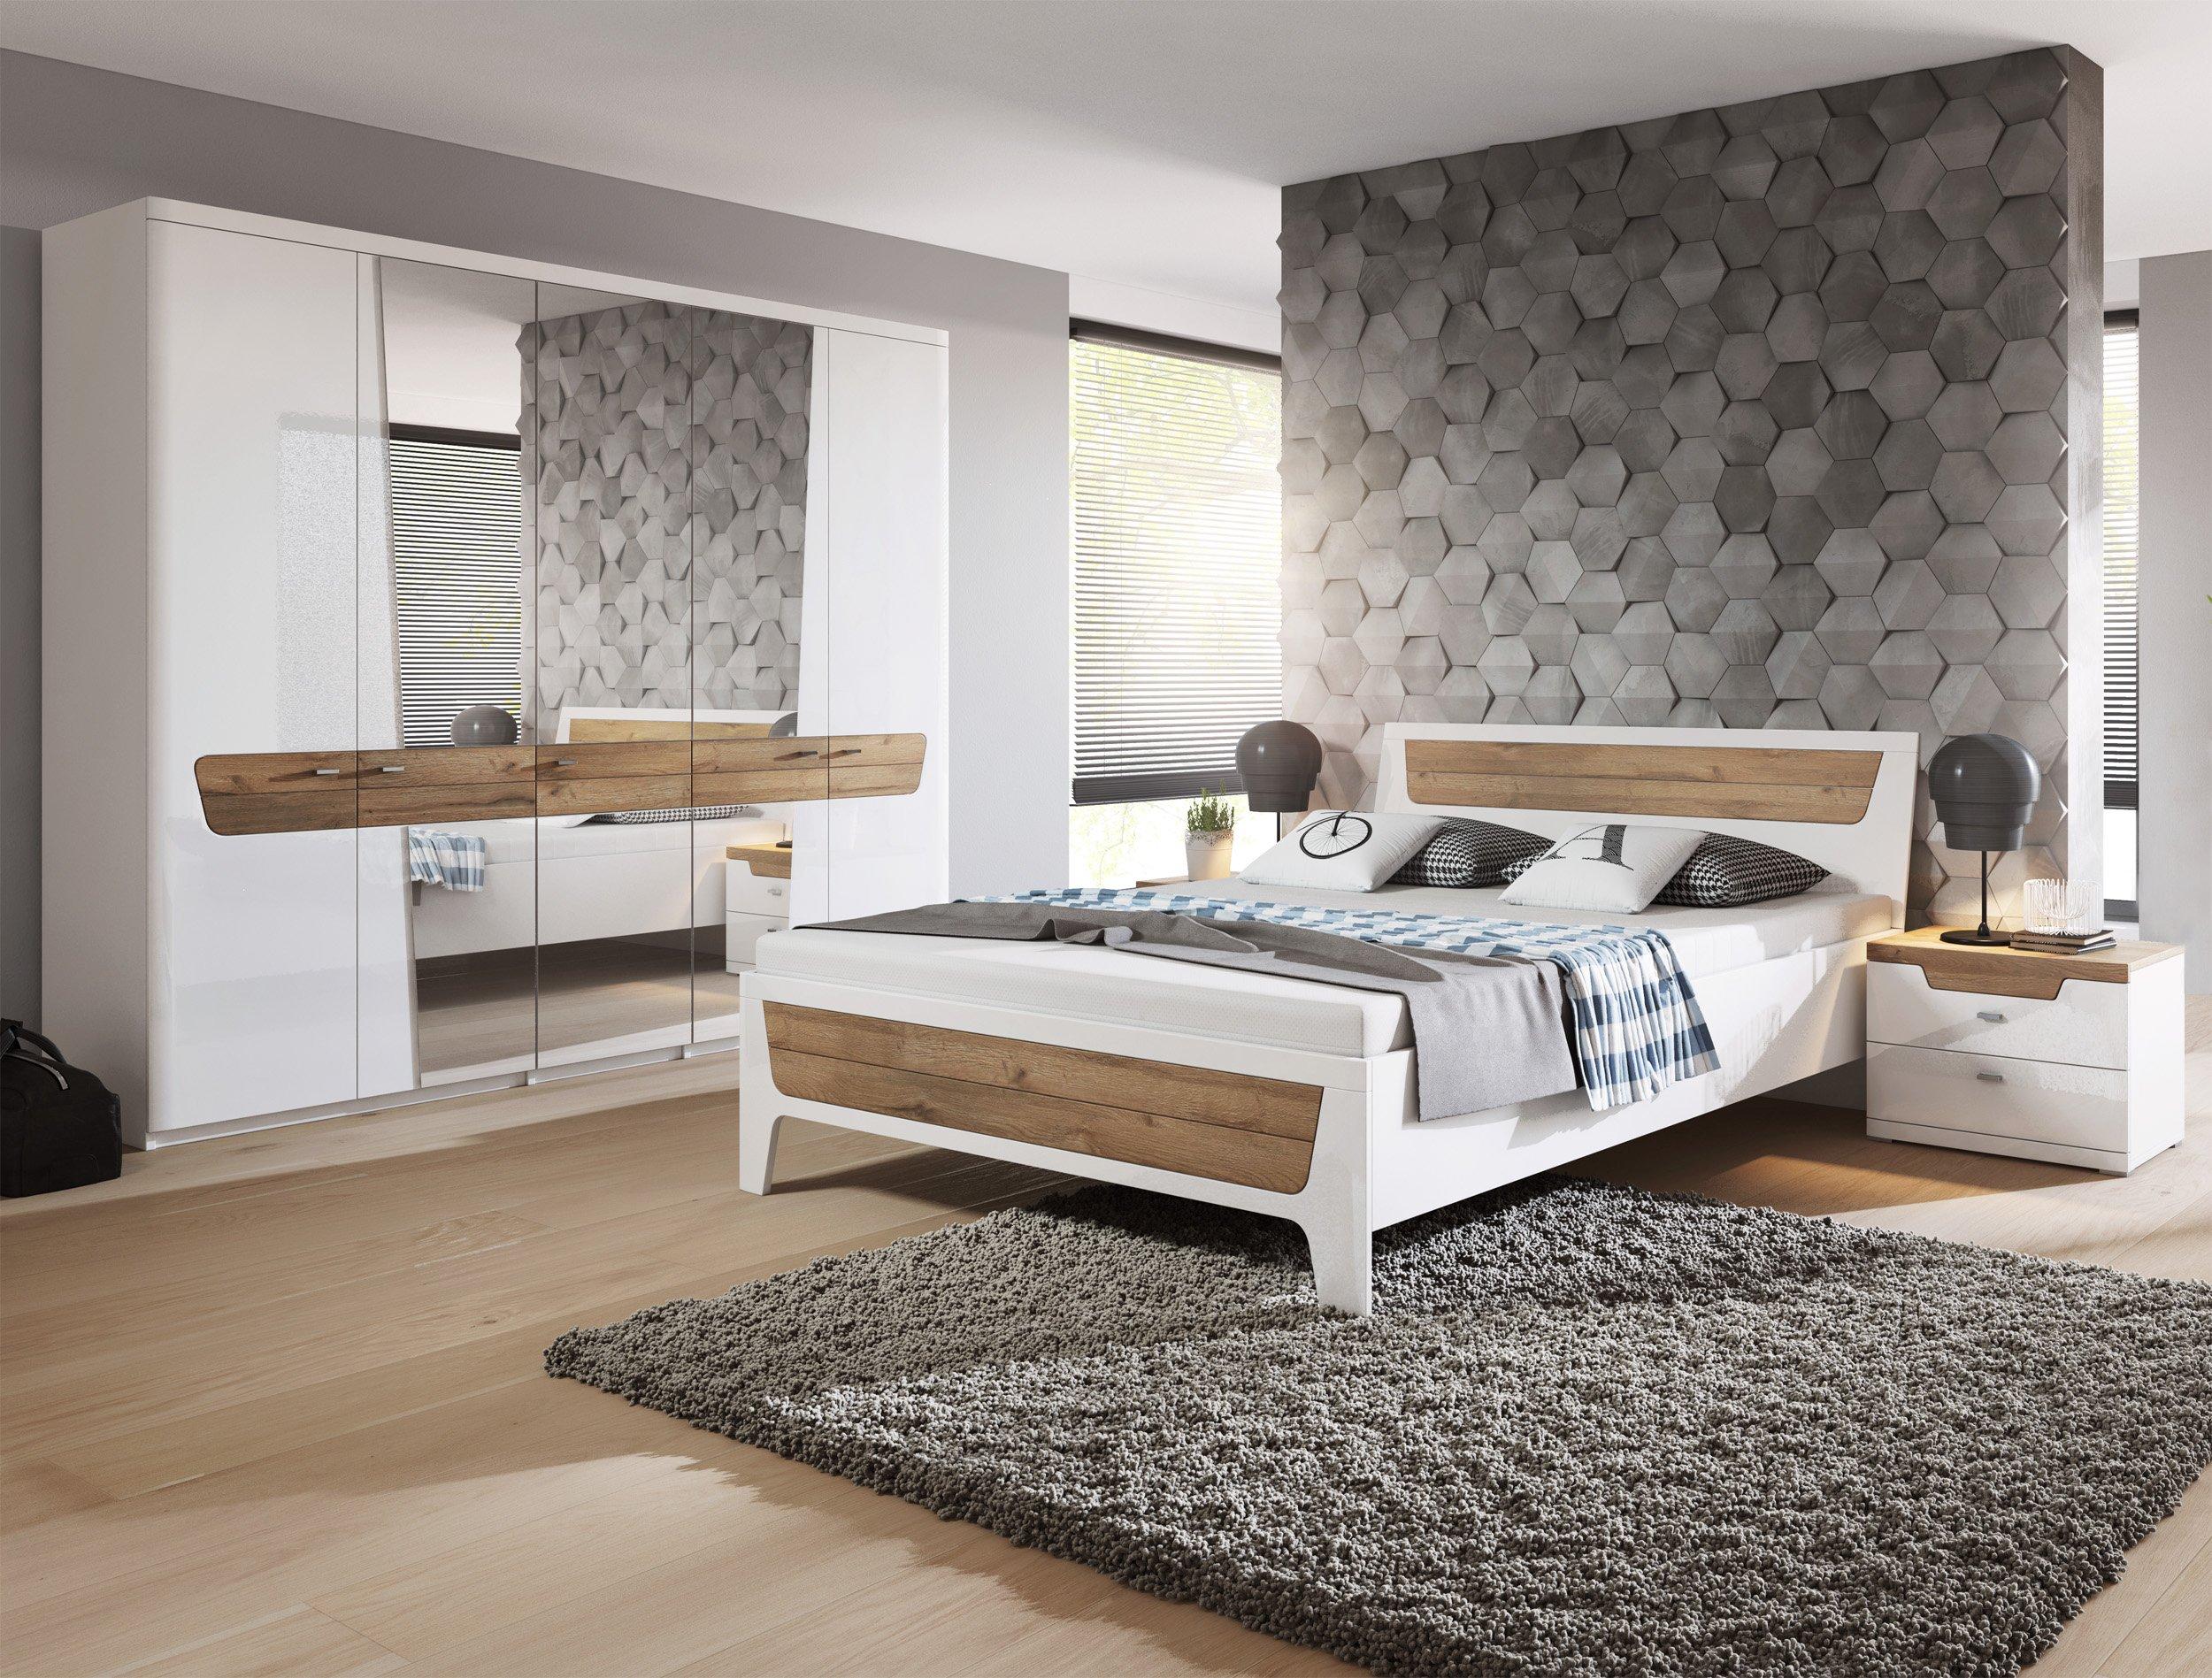 Sypialnia łóżko Szafa Stoliki Nocne Lustra 6999296513